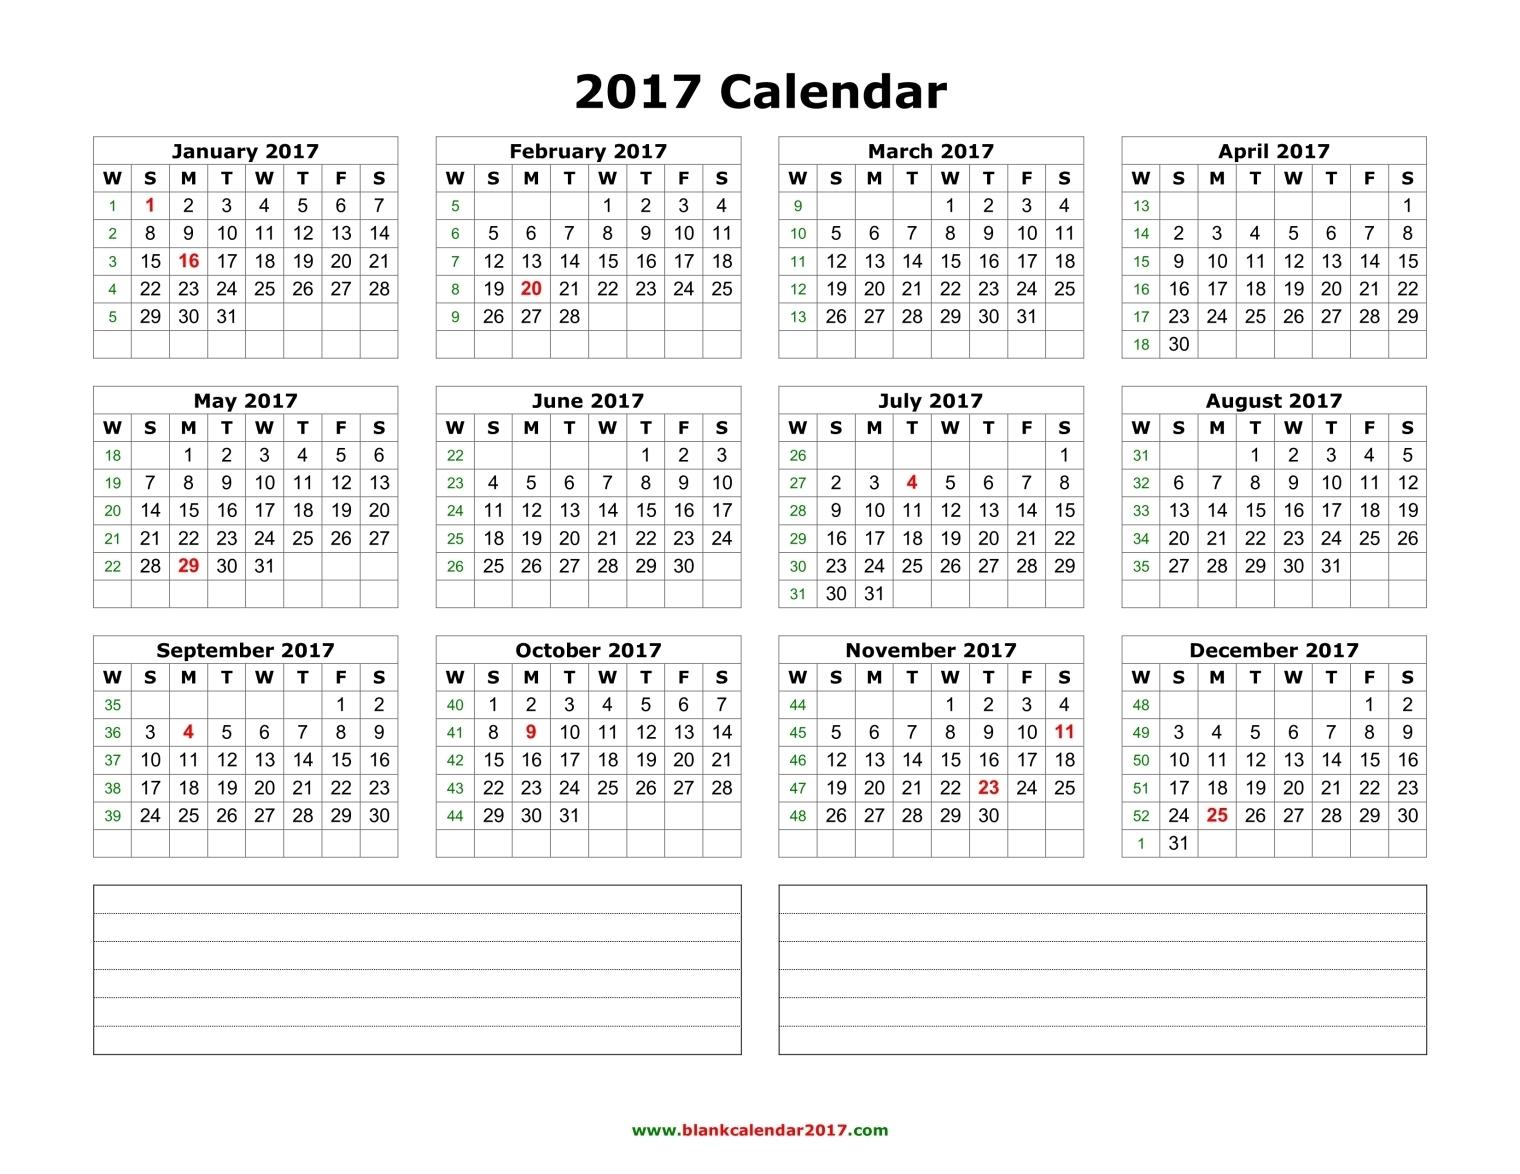 Calendar 2017: 50 Important Calendar Templates Of 2017